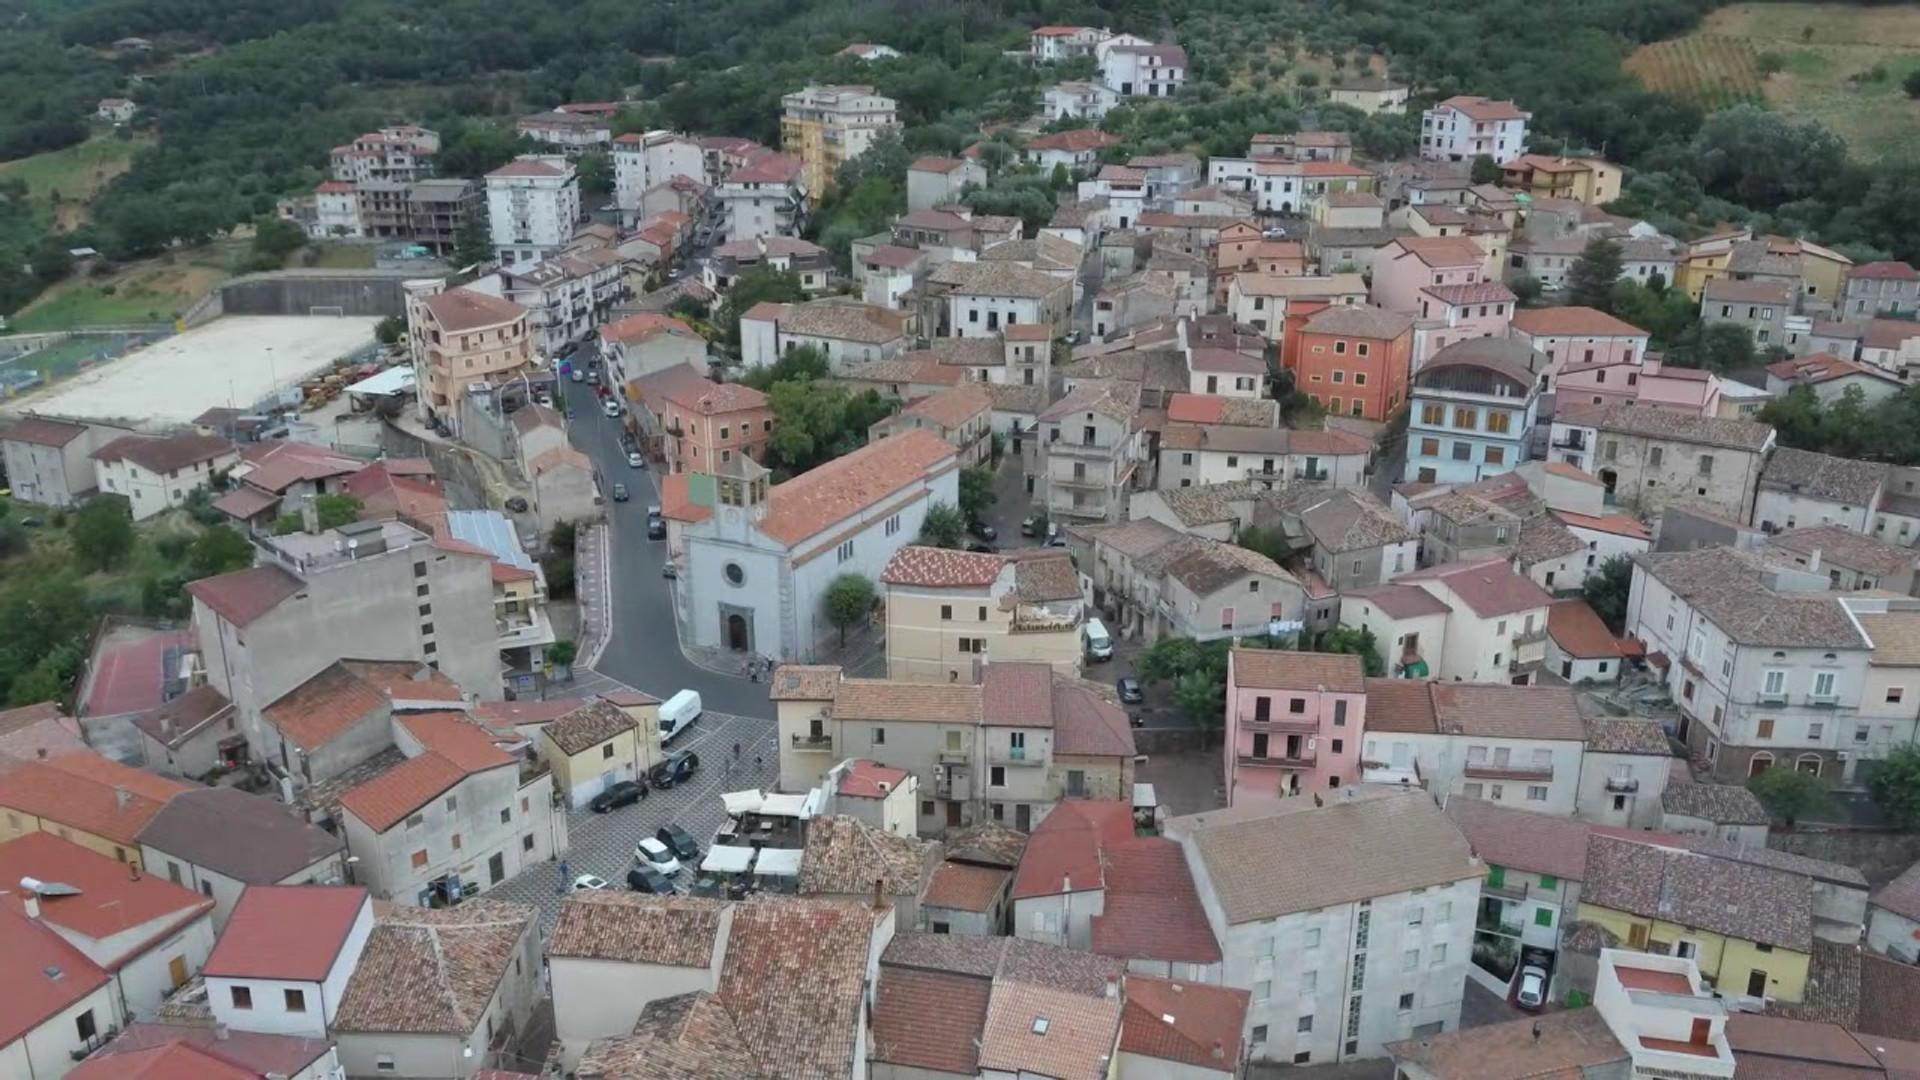 Santa Sofia d'Epiro vista dall'alto